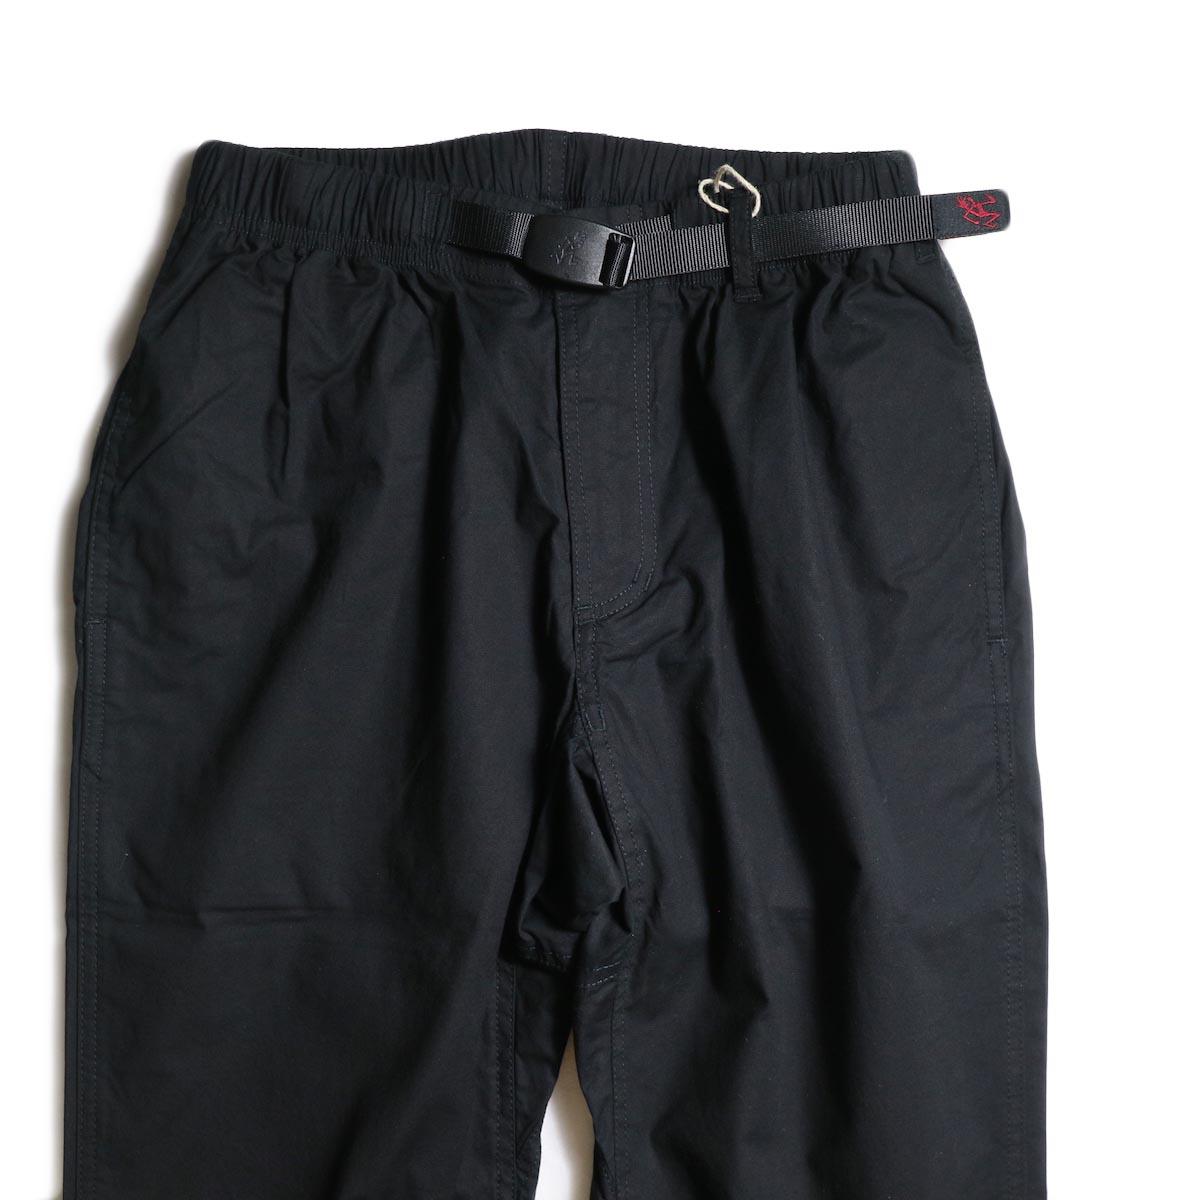 GRAMICCI / Weather NN-Pants Just Cut (Black)ウエスト